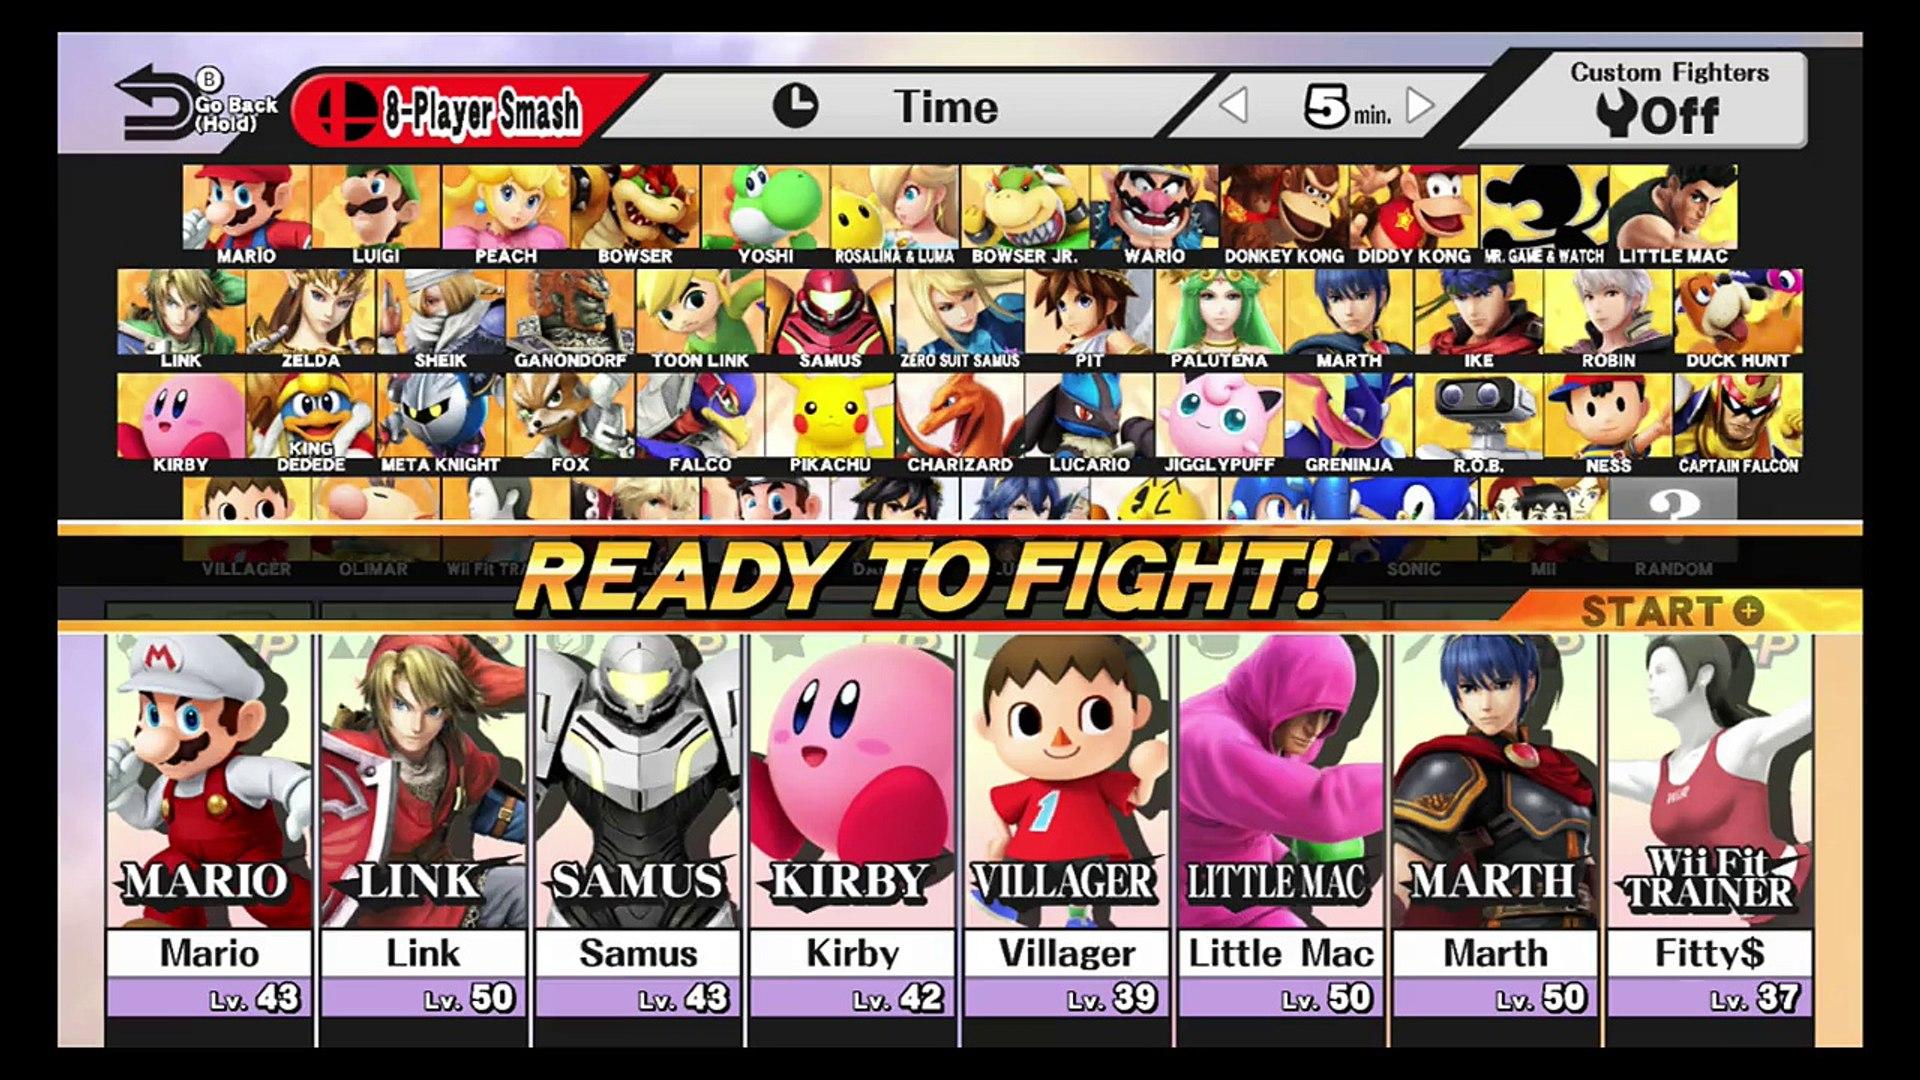 Super Smash Bros Wii U 8 Player Amiibo Training